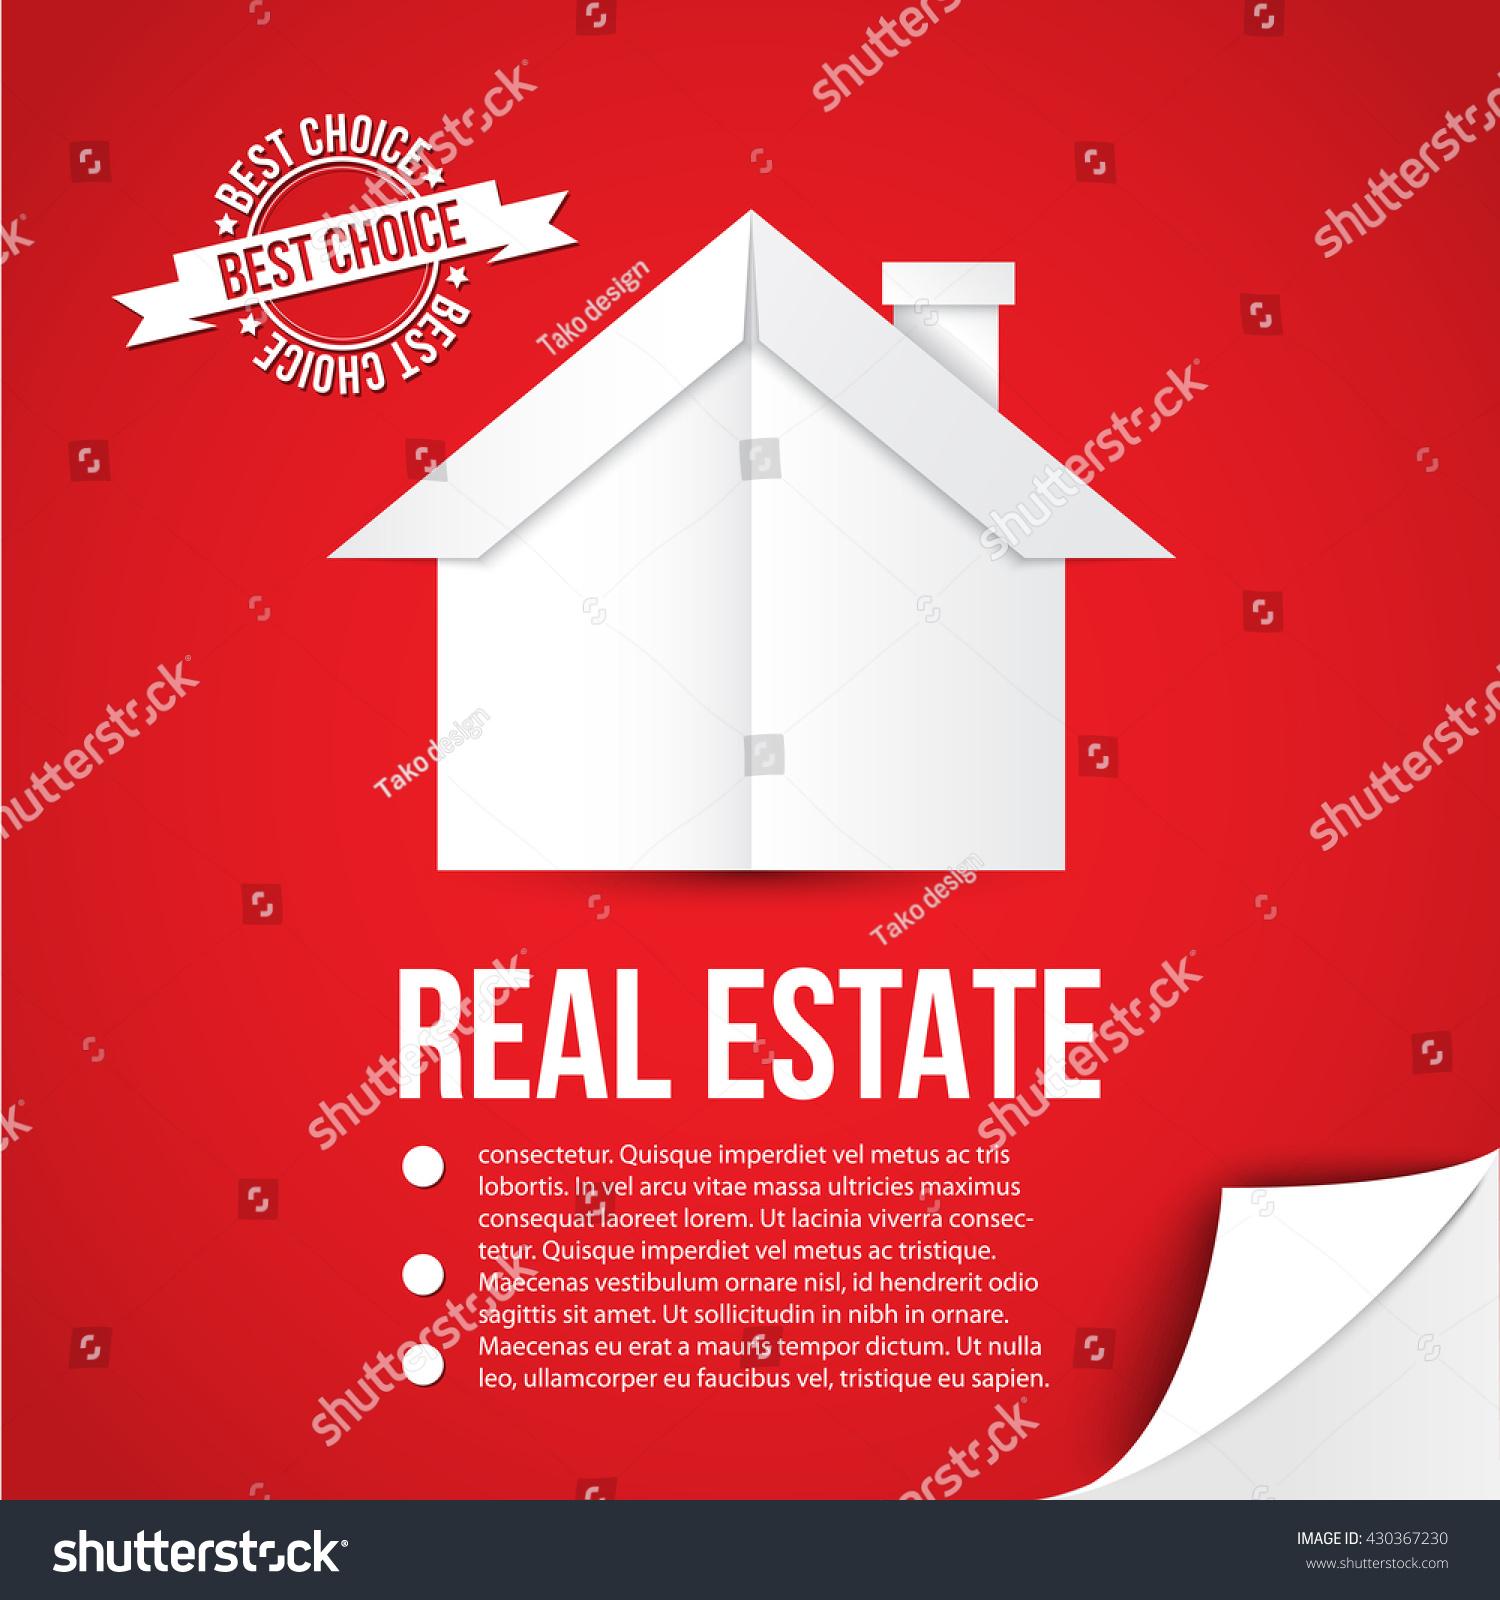 Design banner minimalist - Concept For Corporate Identity Or Web Banner Minimalist